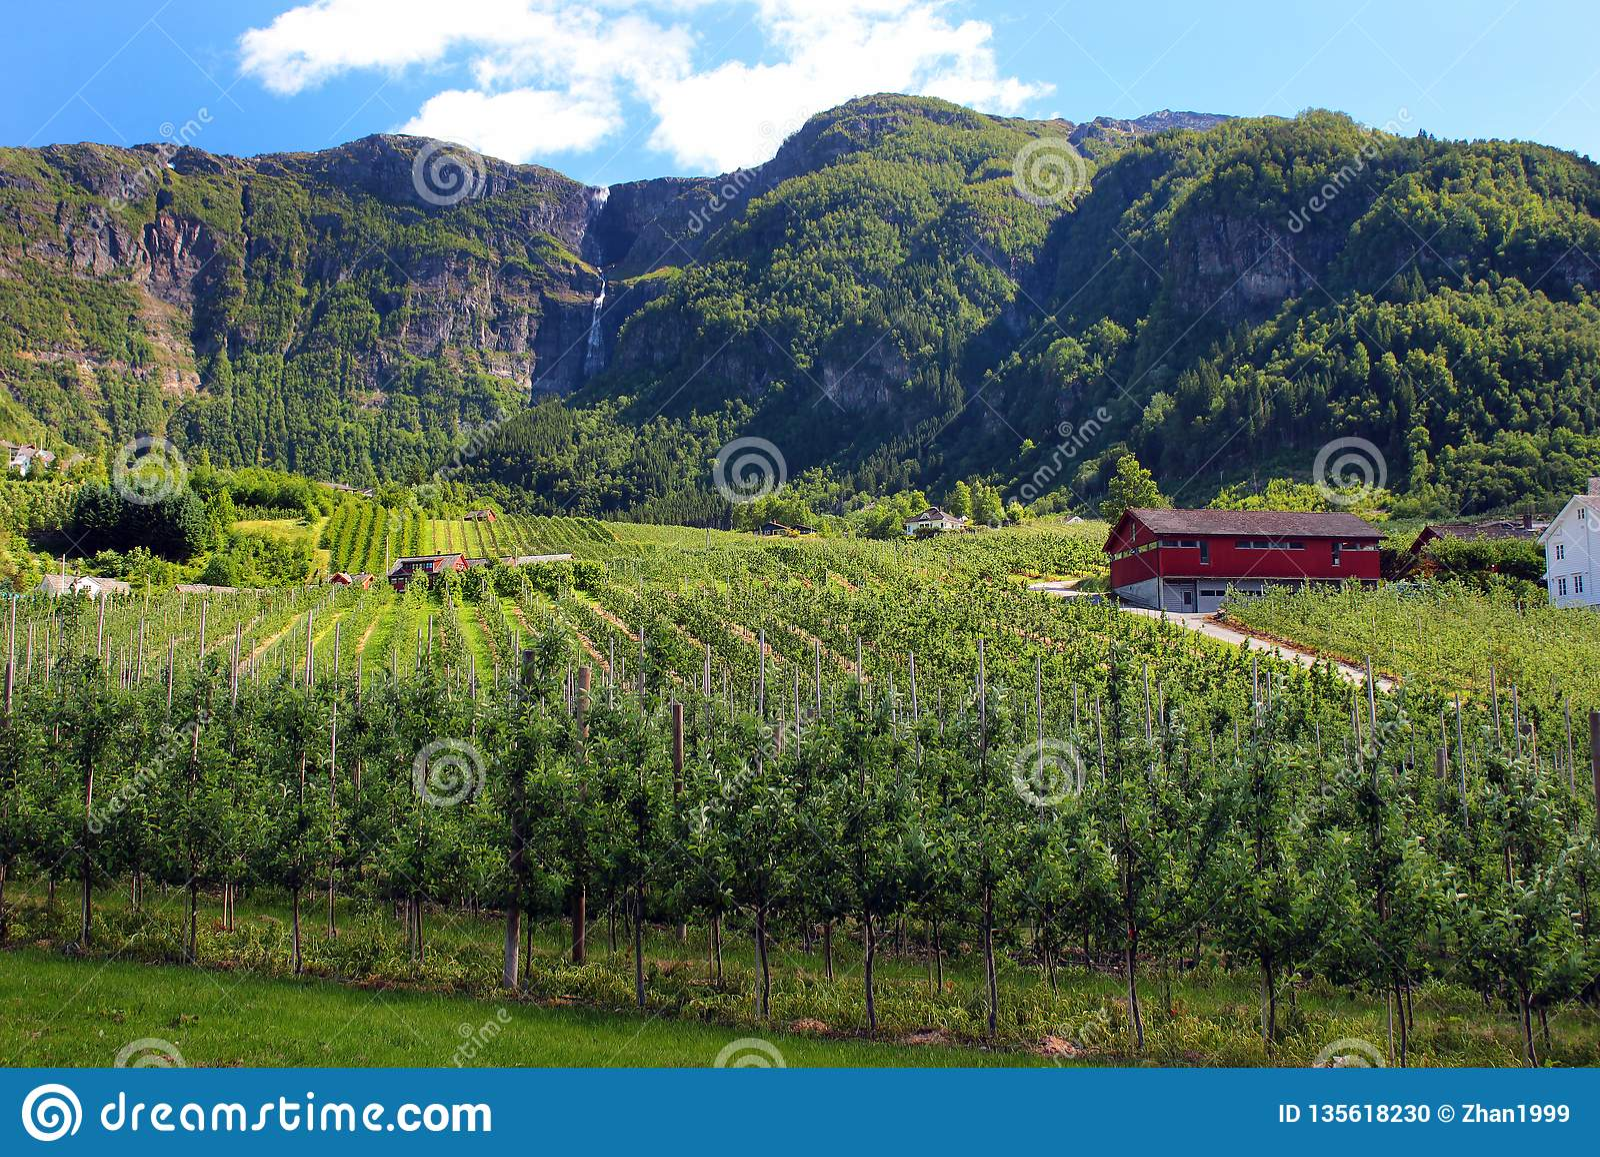 Fruit gardens in Lofthus, near the Hardanger fjord, Hordaland county, Norway